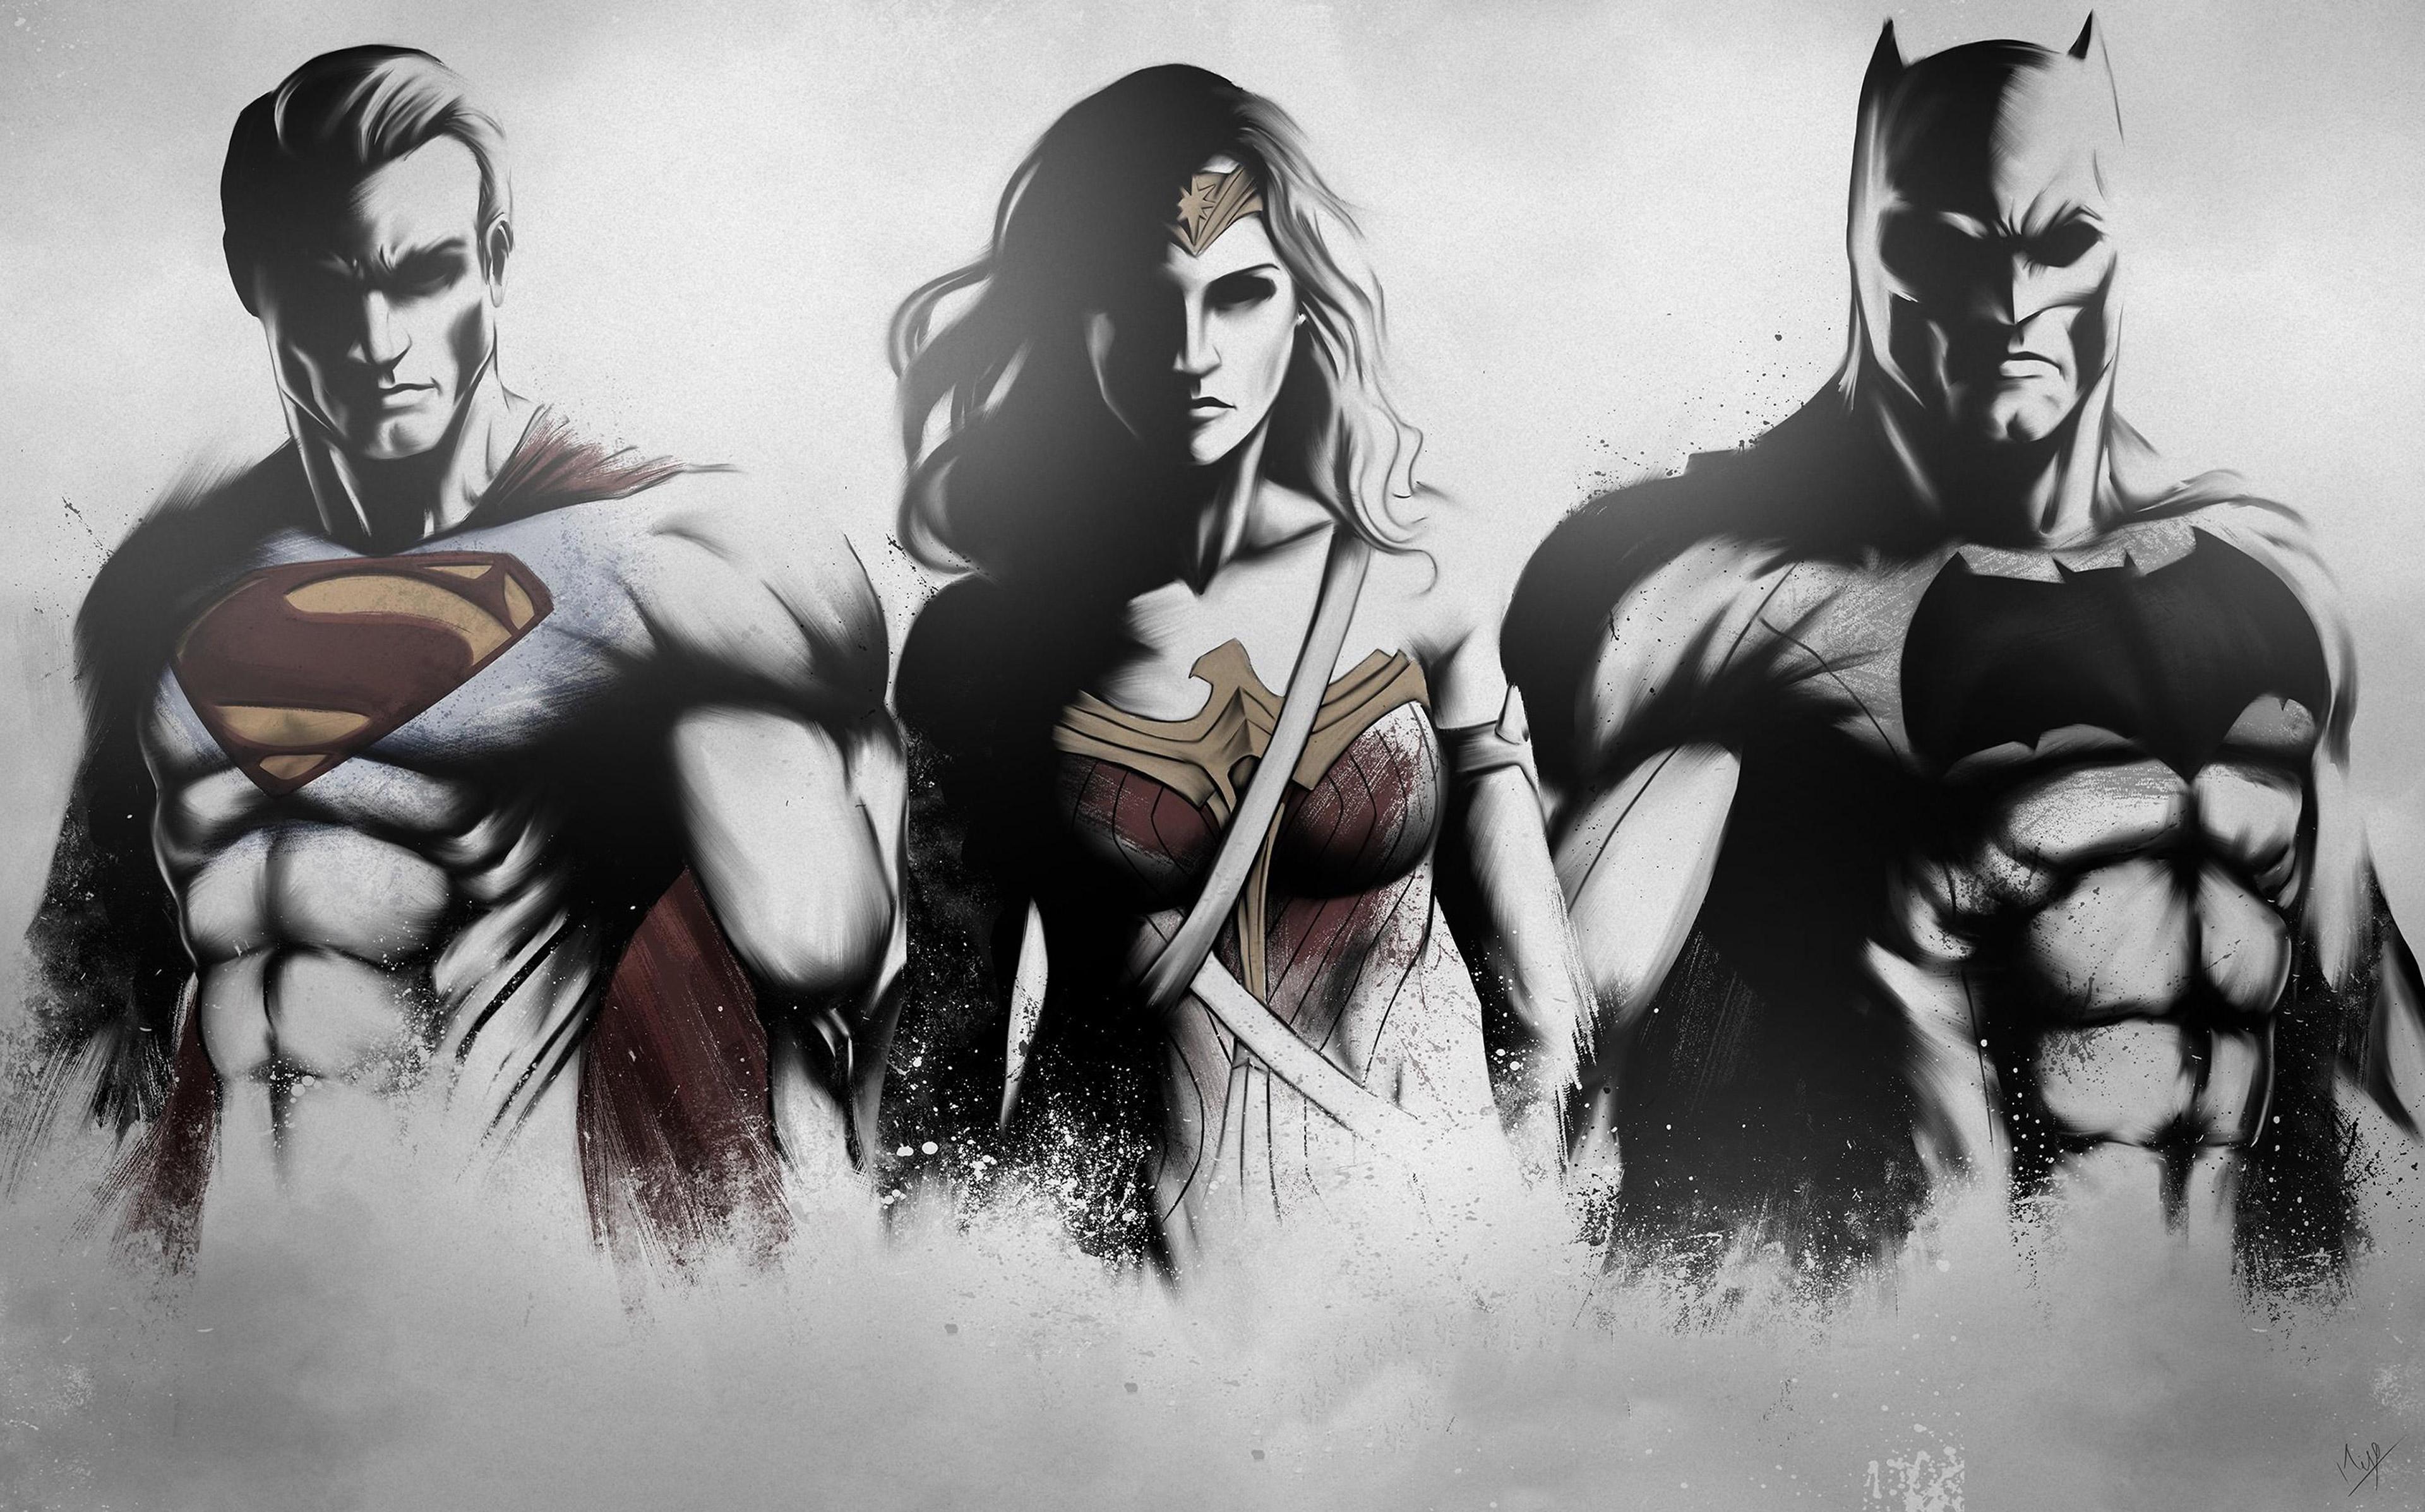 Superman Wonder Woman Batman Art Sketch 4k Hd Superheroes 4k